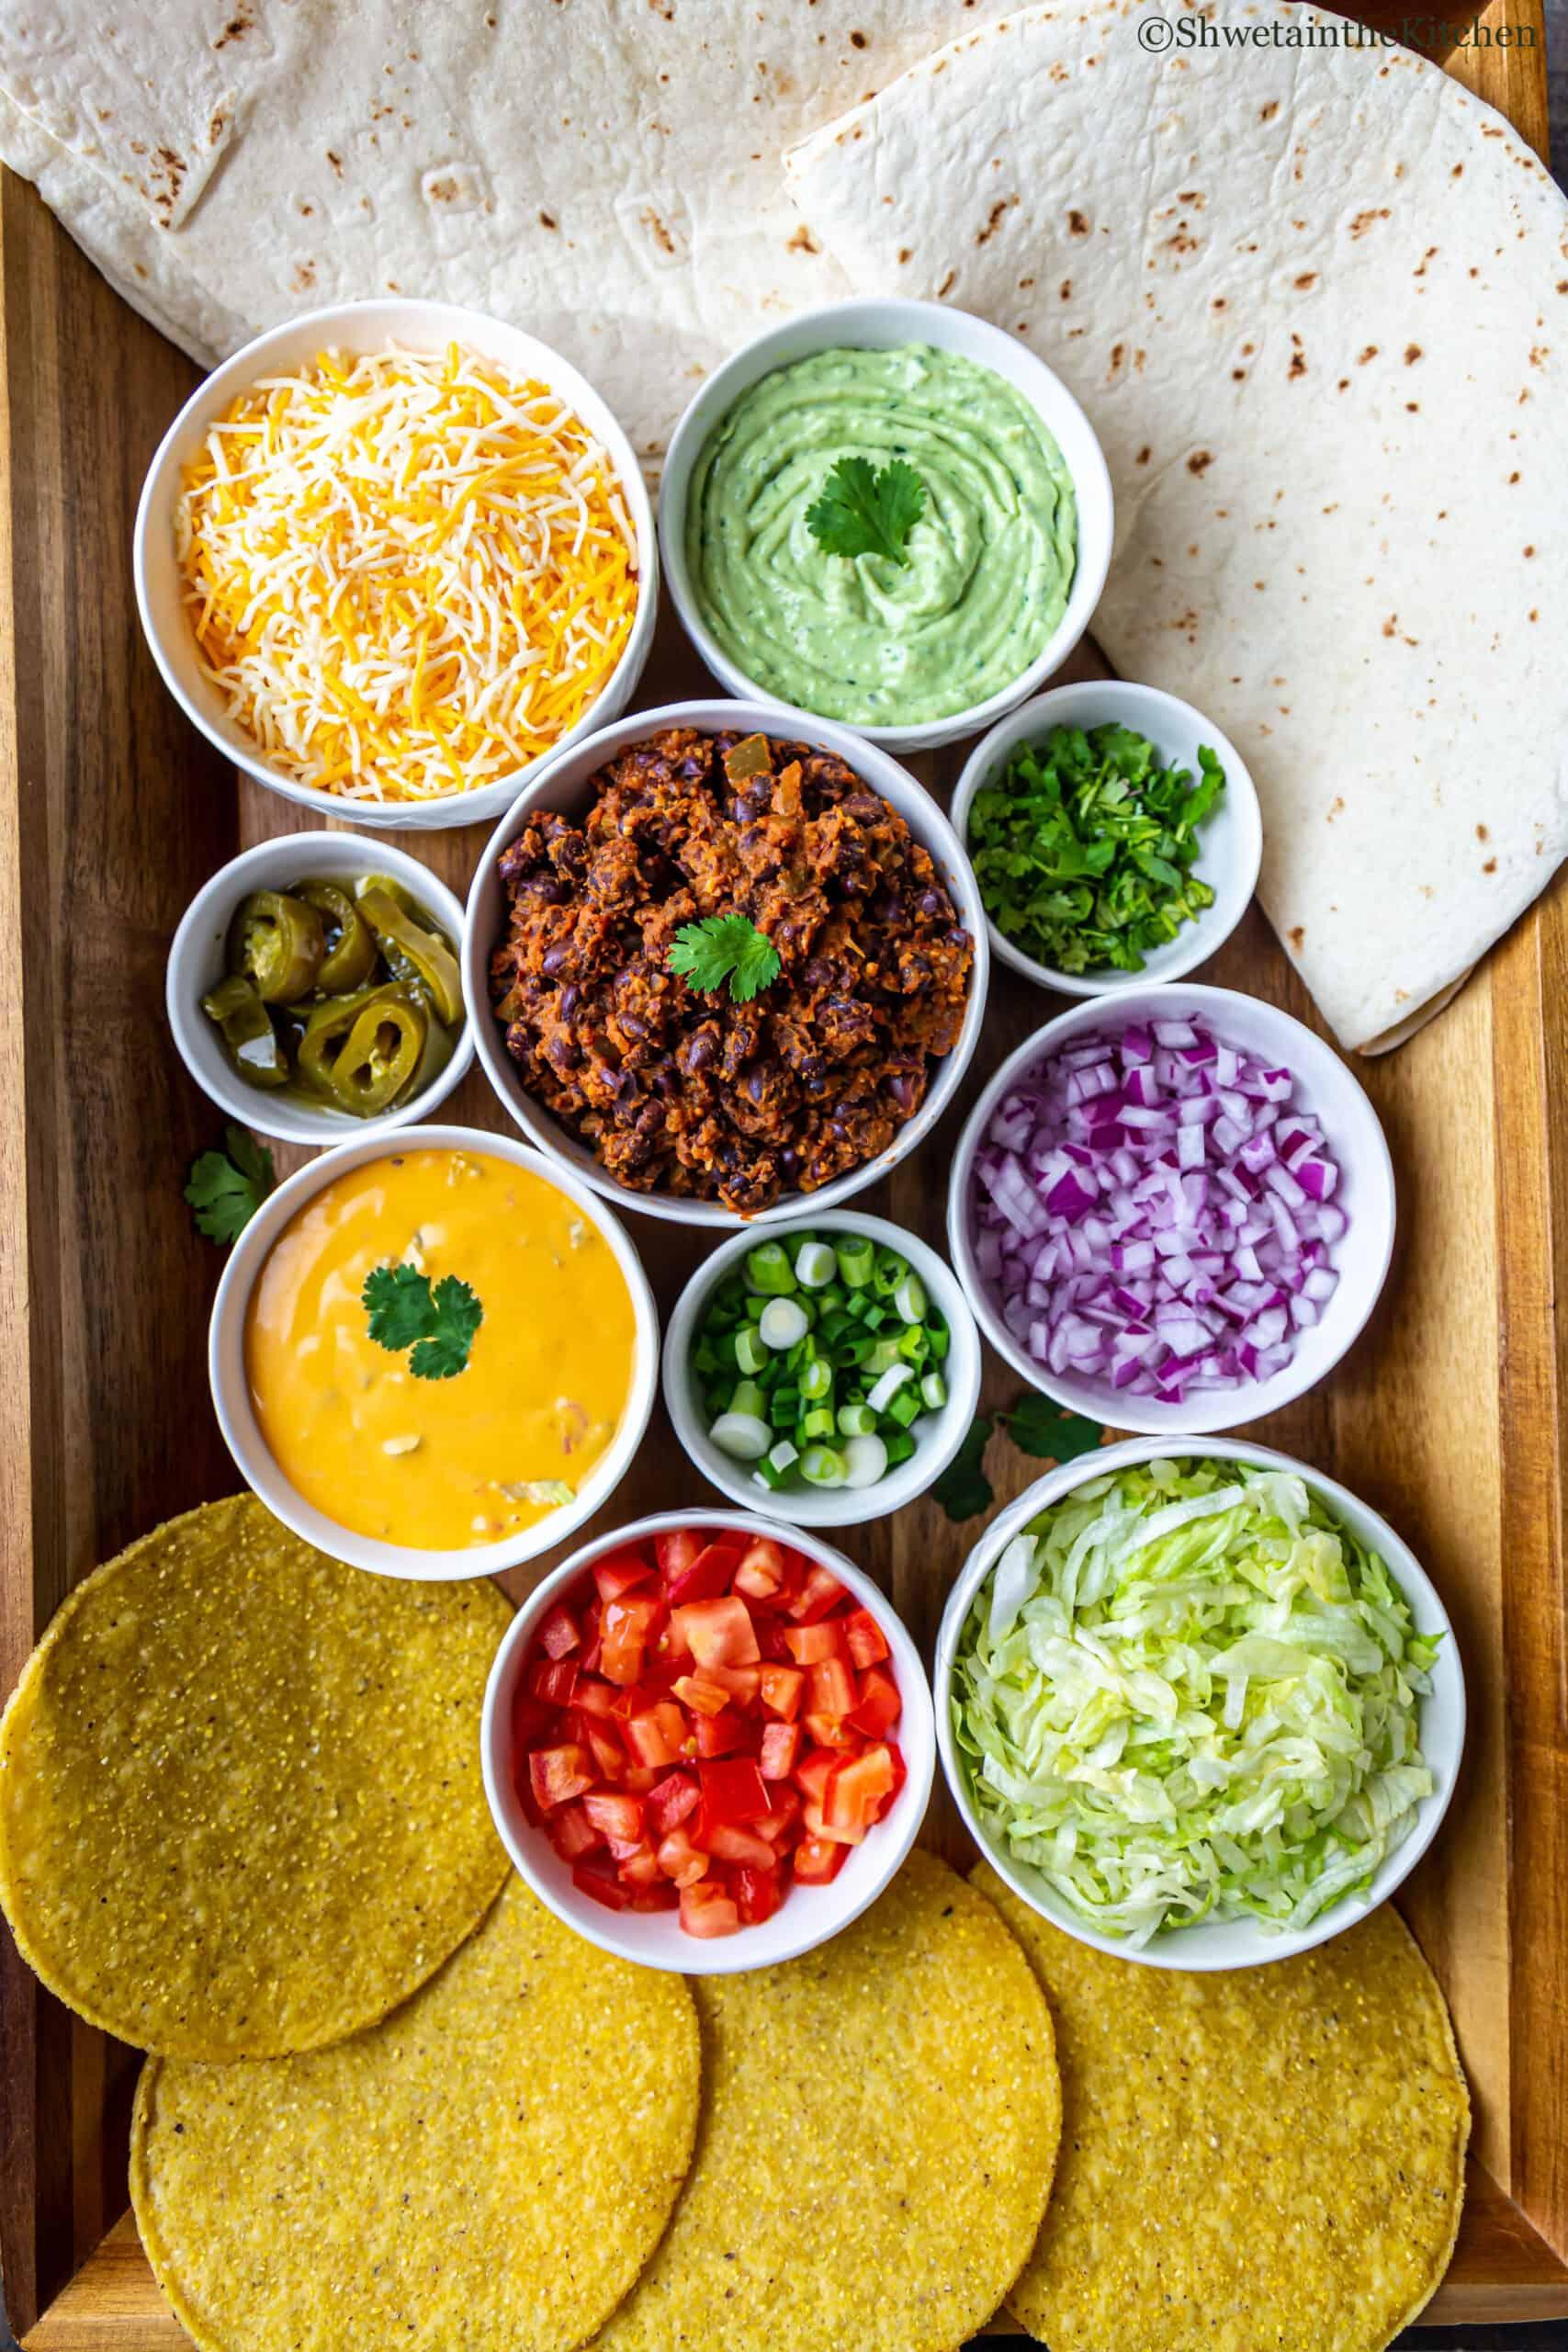 Vegetarian Crunchwrap Supreme - Ingredients